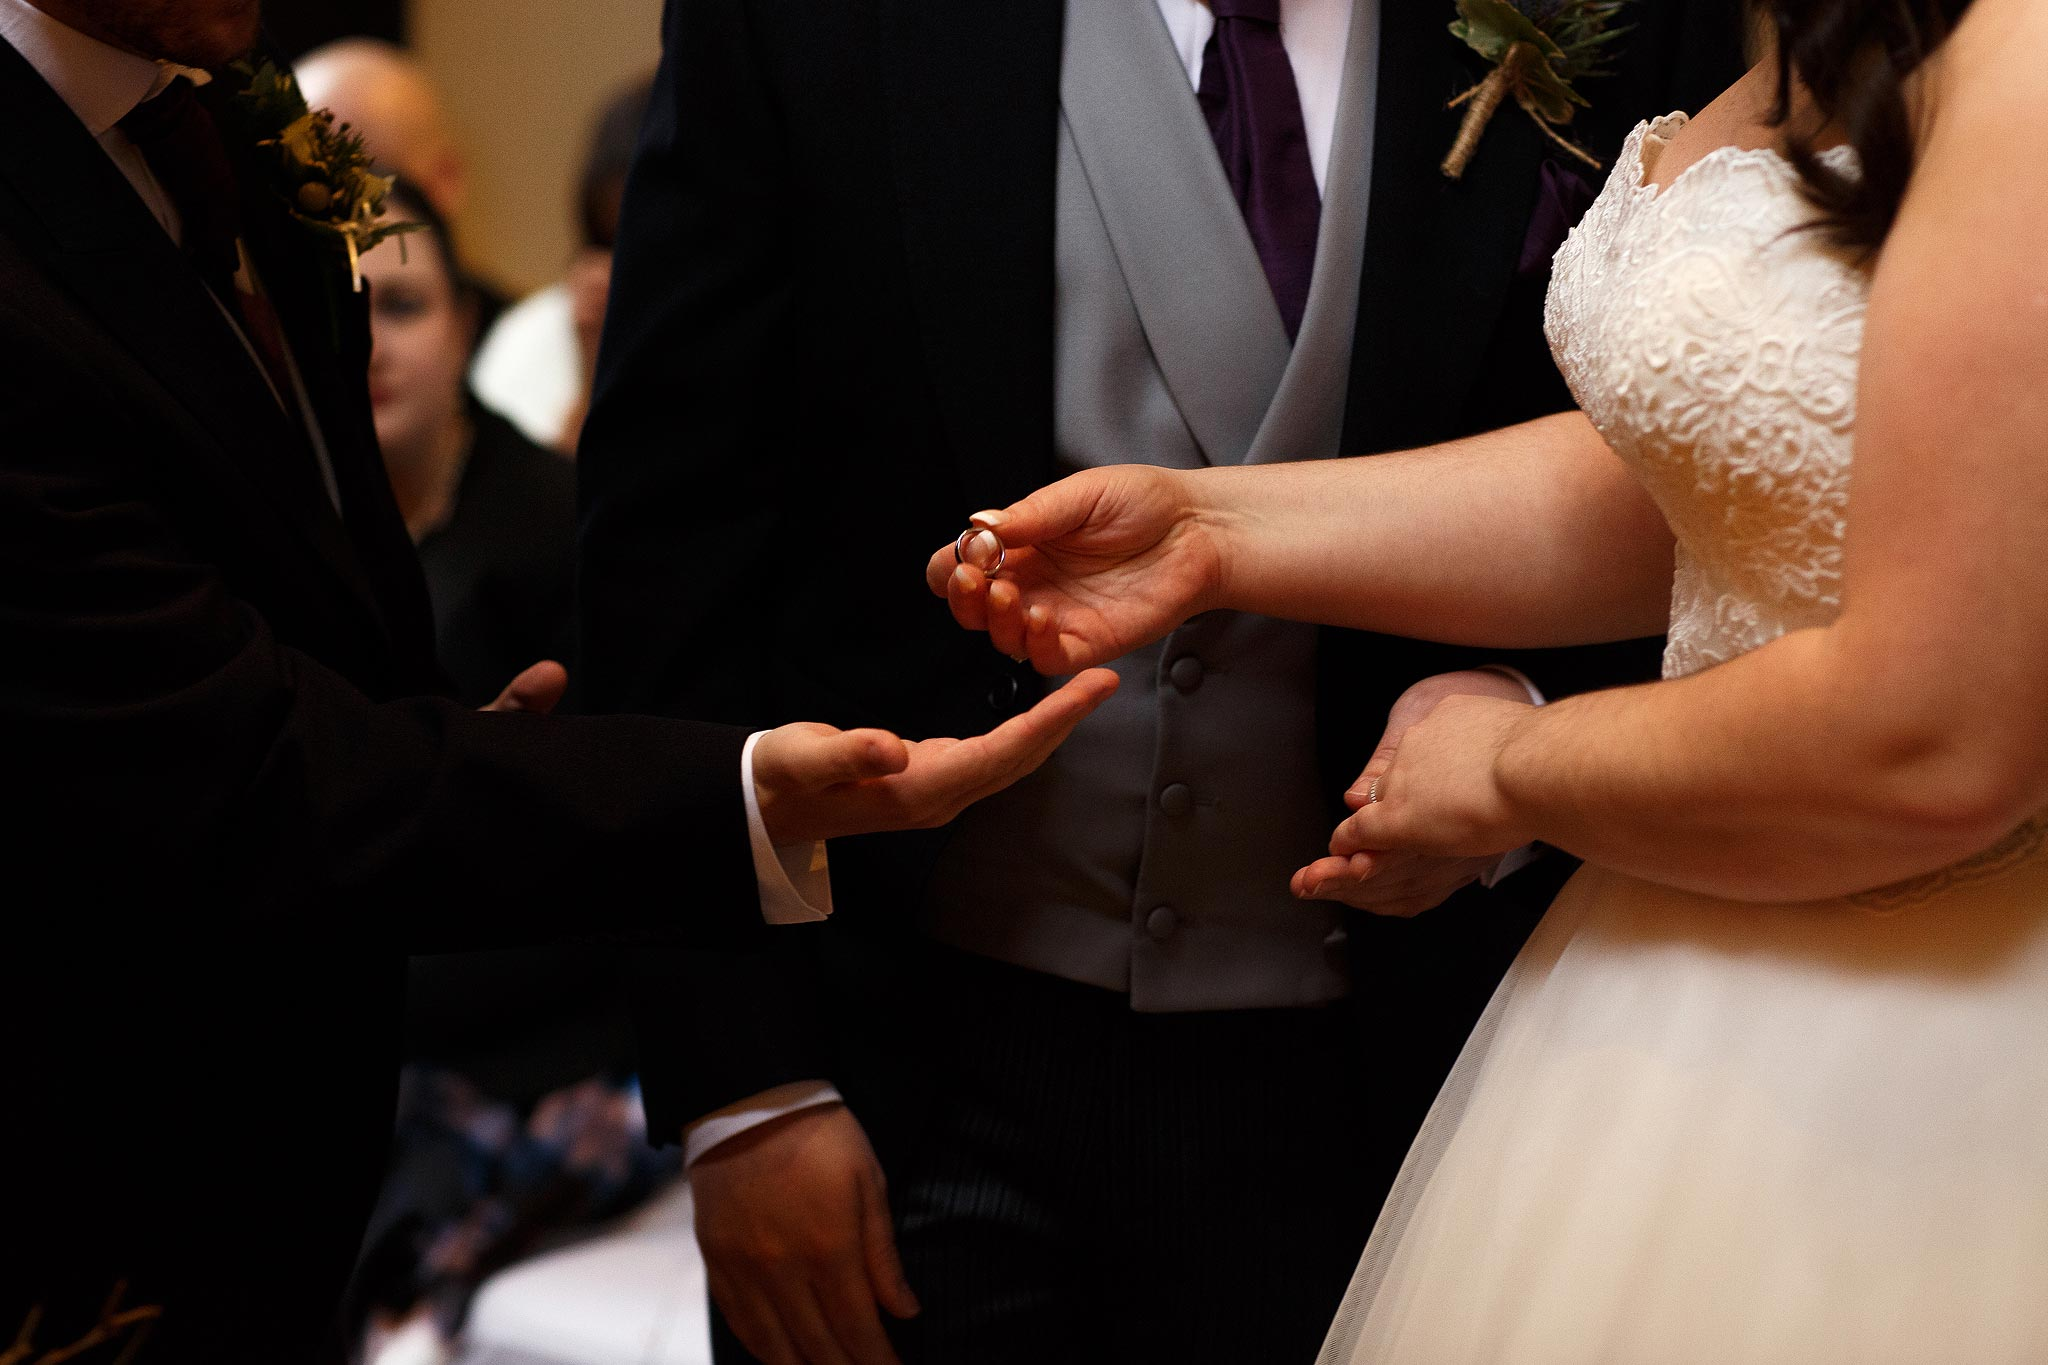 Bride and groom exchanging rings aat Samlesbury Hall Wedding